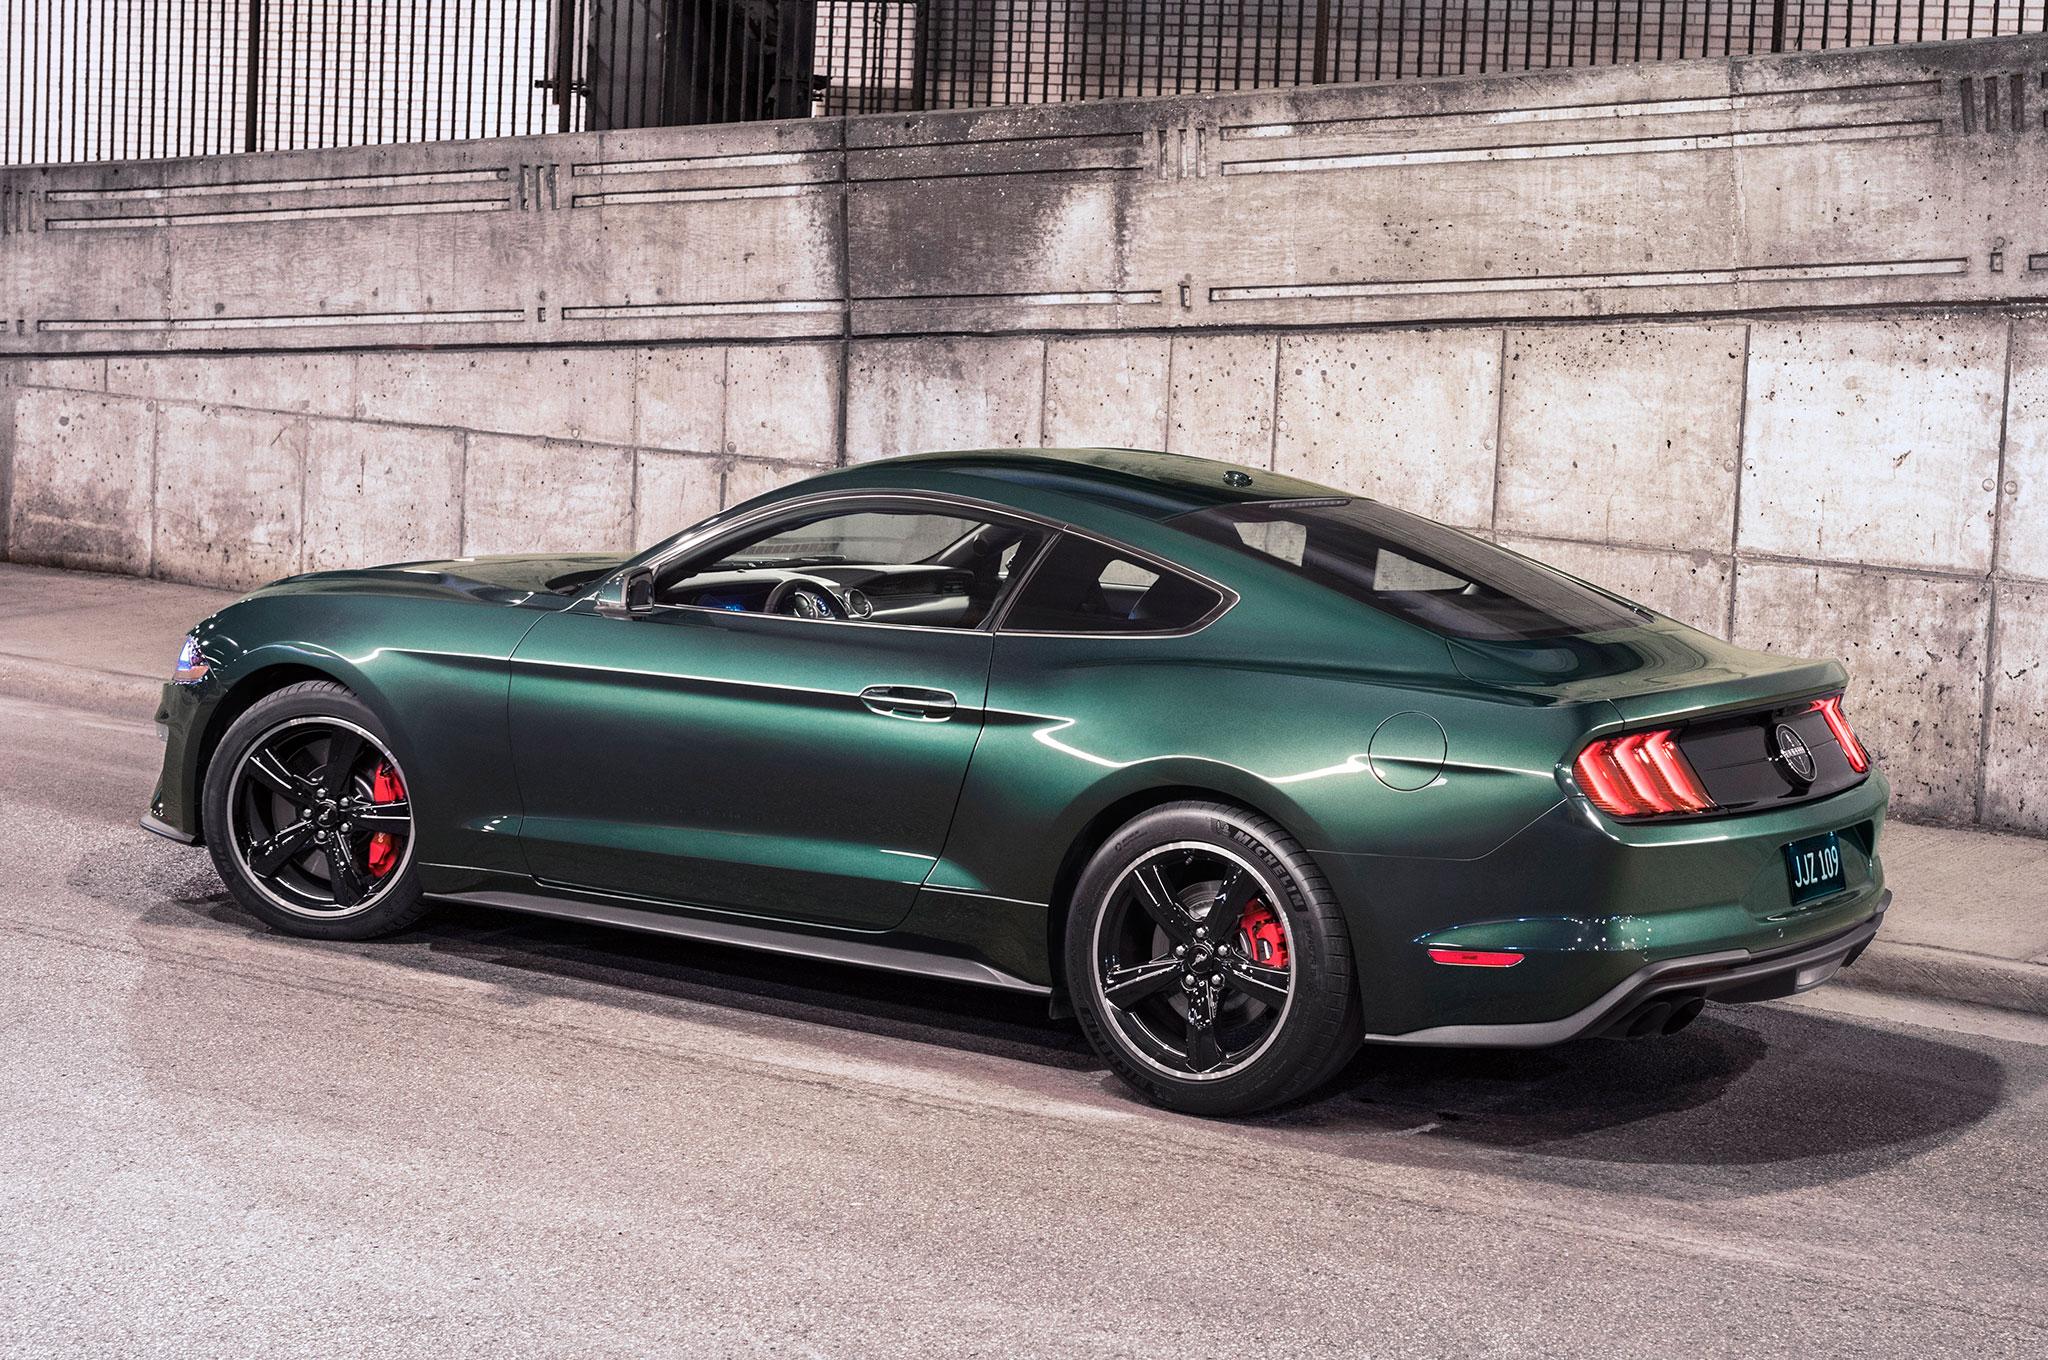 2019 Ford Mustang Sports Car The Bullitt Is Back >> 2019 Ford Mustang Bullitt Is Back For Film S 50th Automobile Magazine